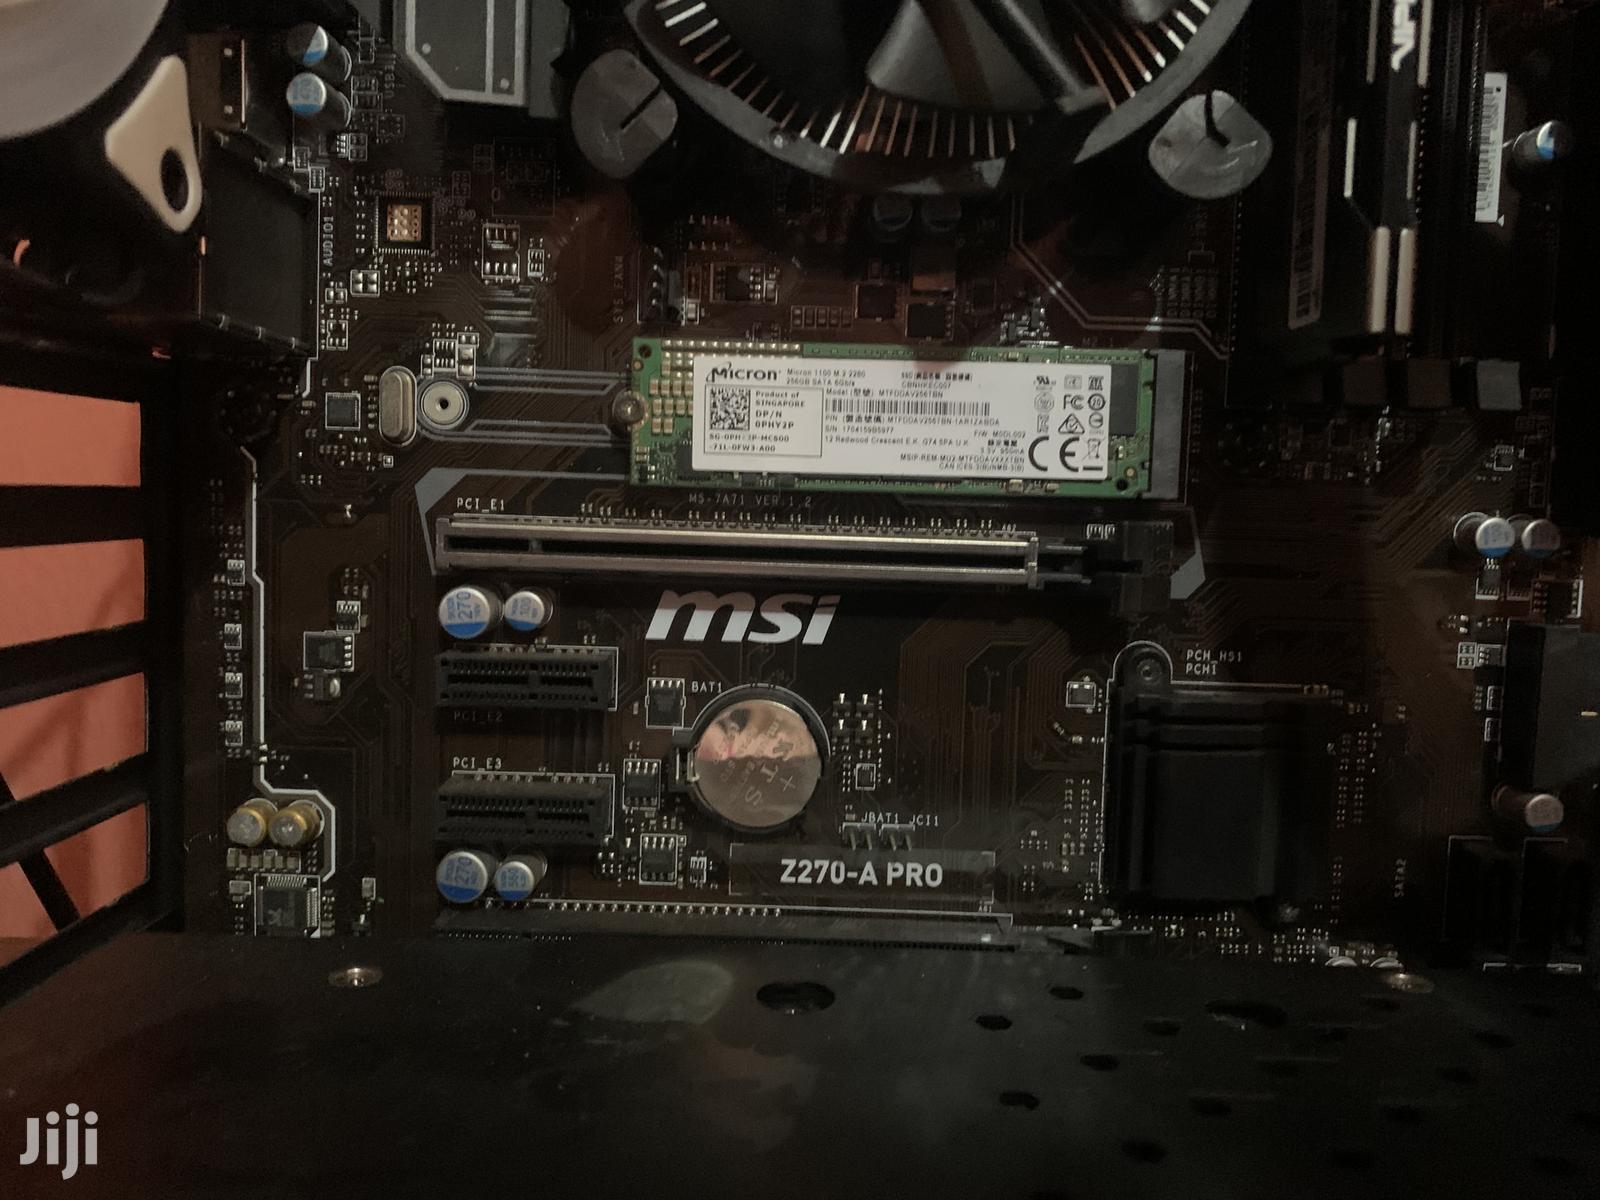 Archive: Msi Z270-A Pro Motherboard And Intel Core I5 6500 Processor